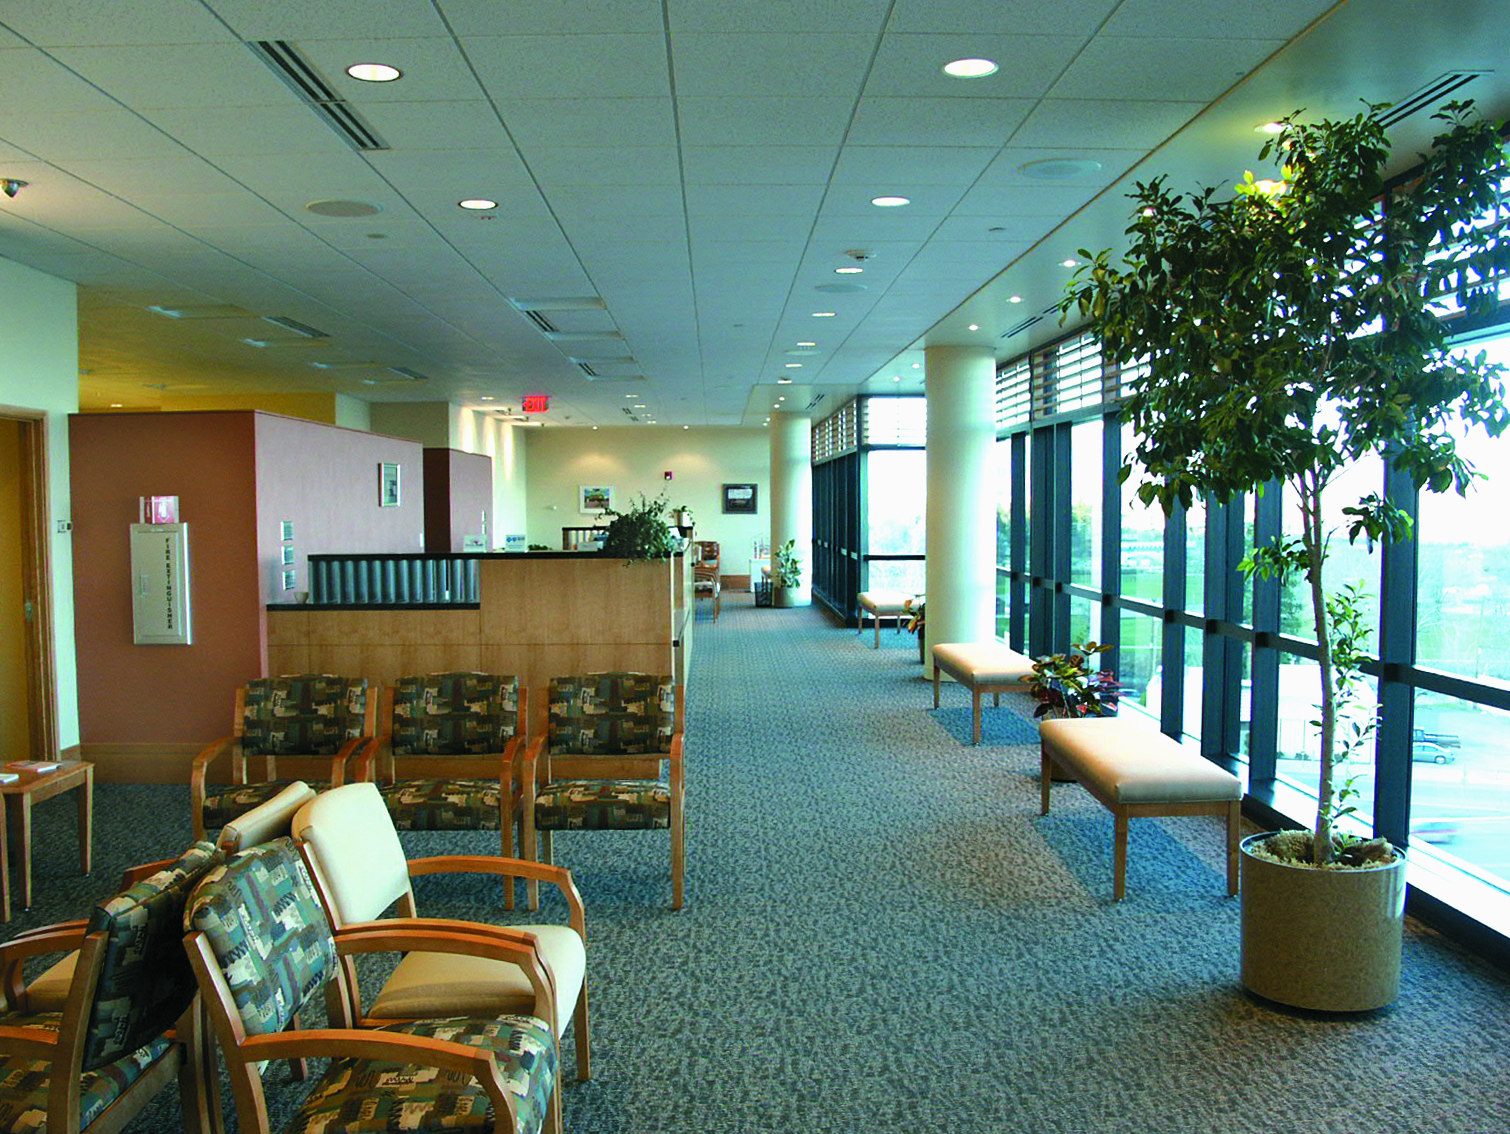 5TH Waiting Room.jpg